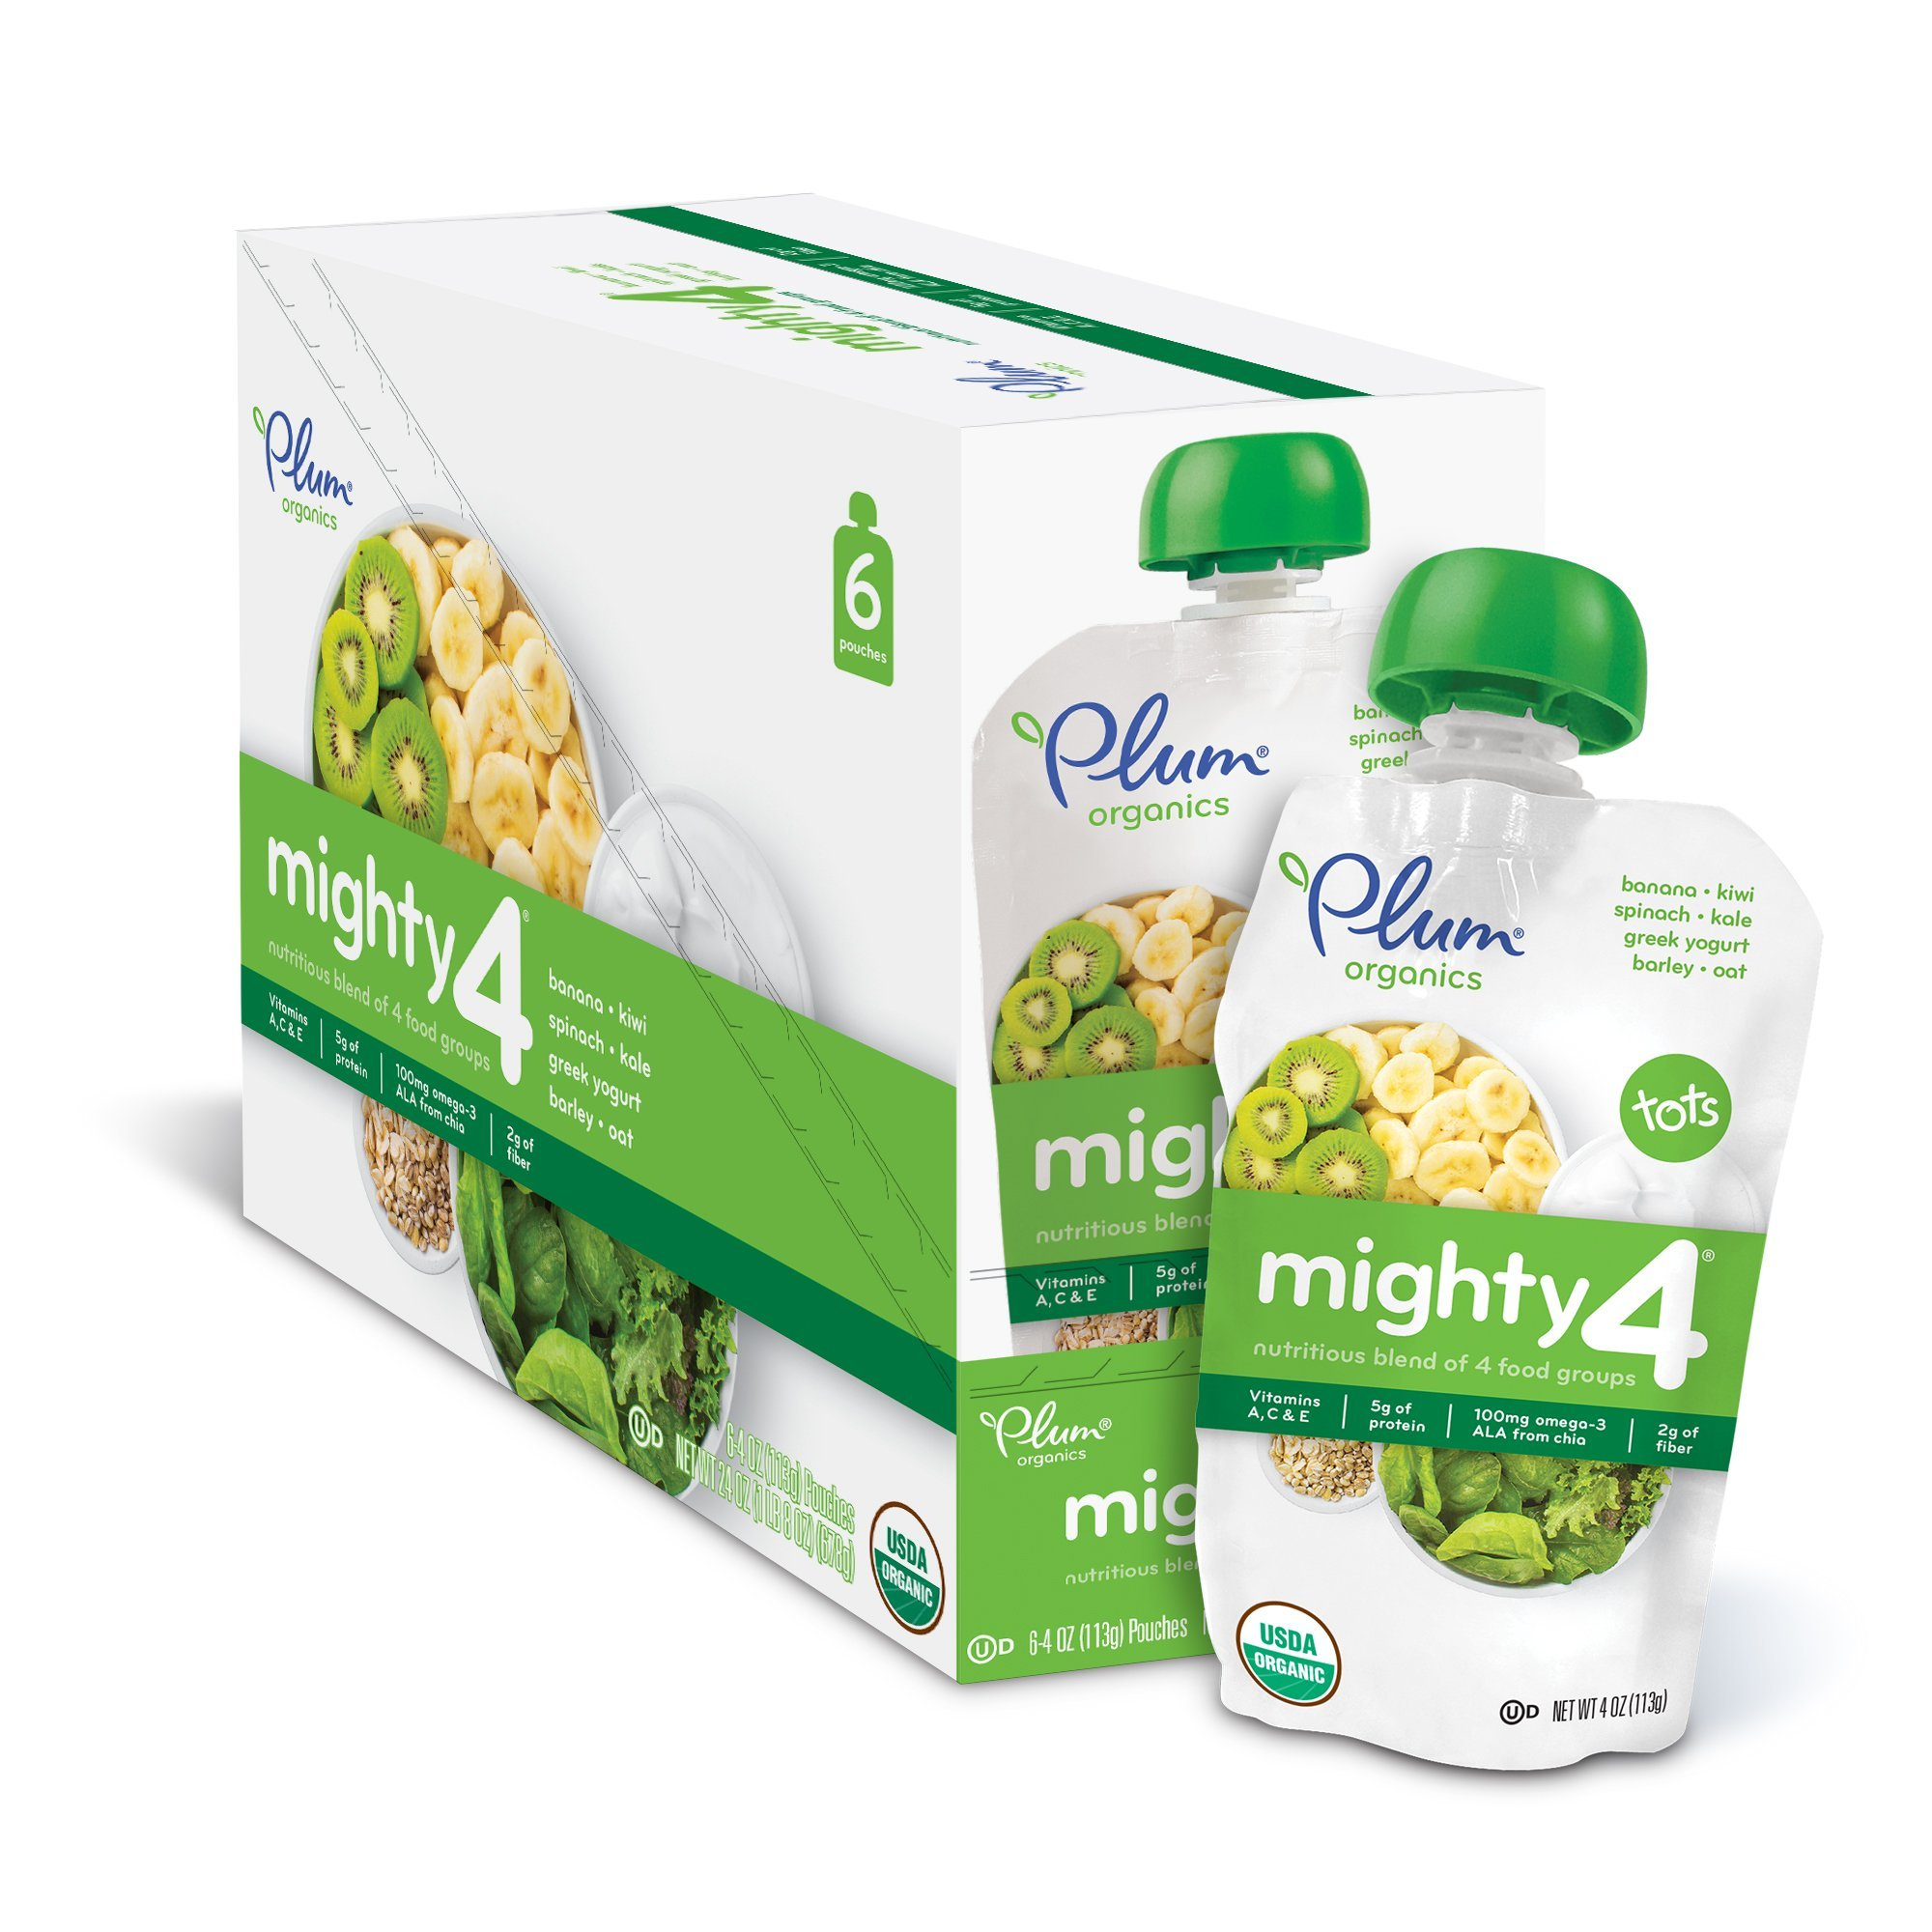 Plum Organics Mighty 4, Organic Toddler Food, Banana, Kiwi, Spinach, Kale, Greek Yogurt, Barley and Oat, 4 ounce pouch (Pack of 12)